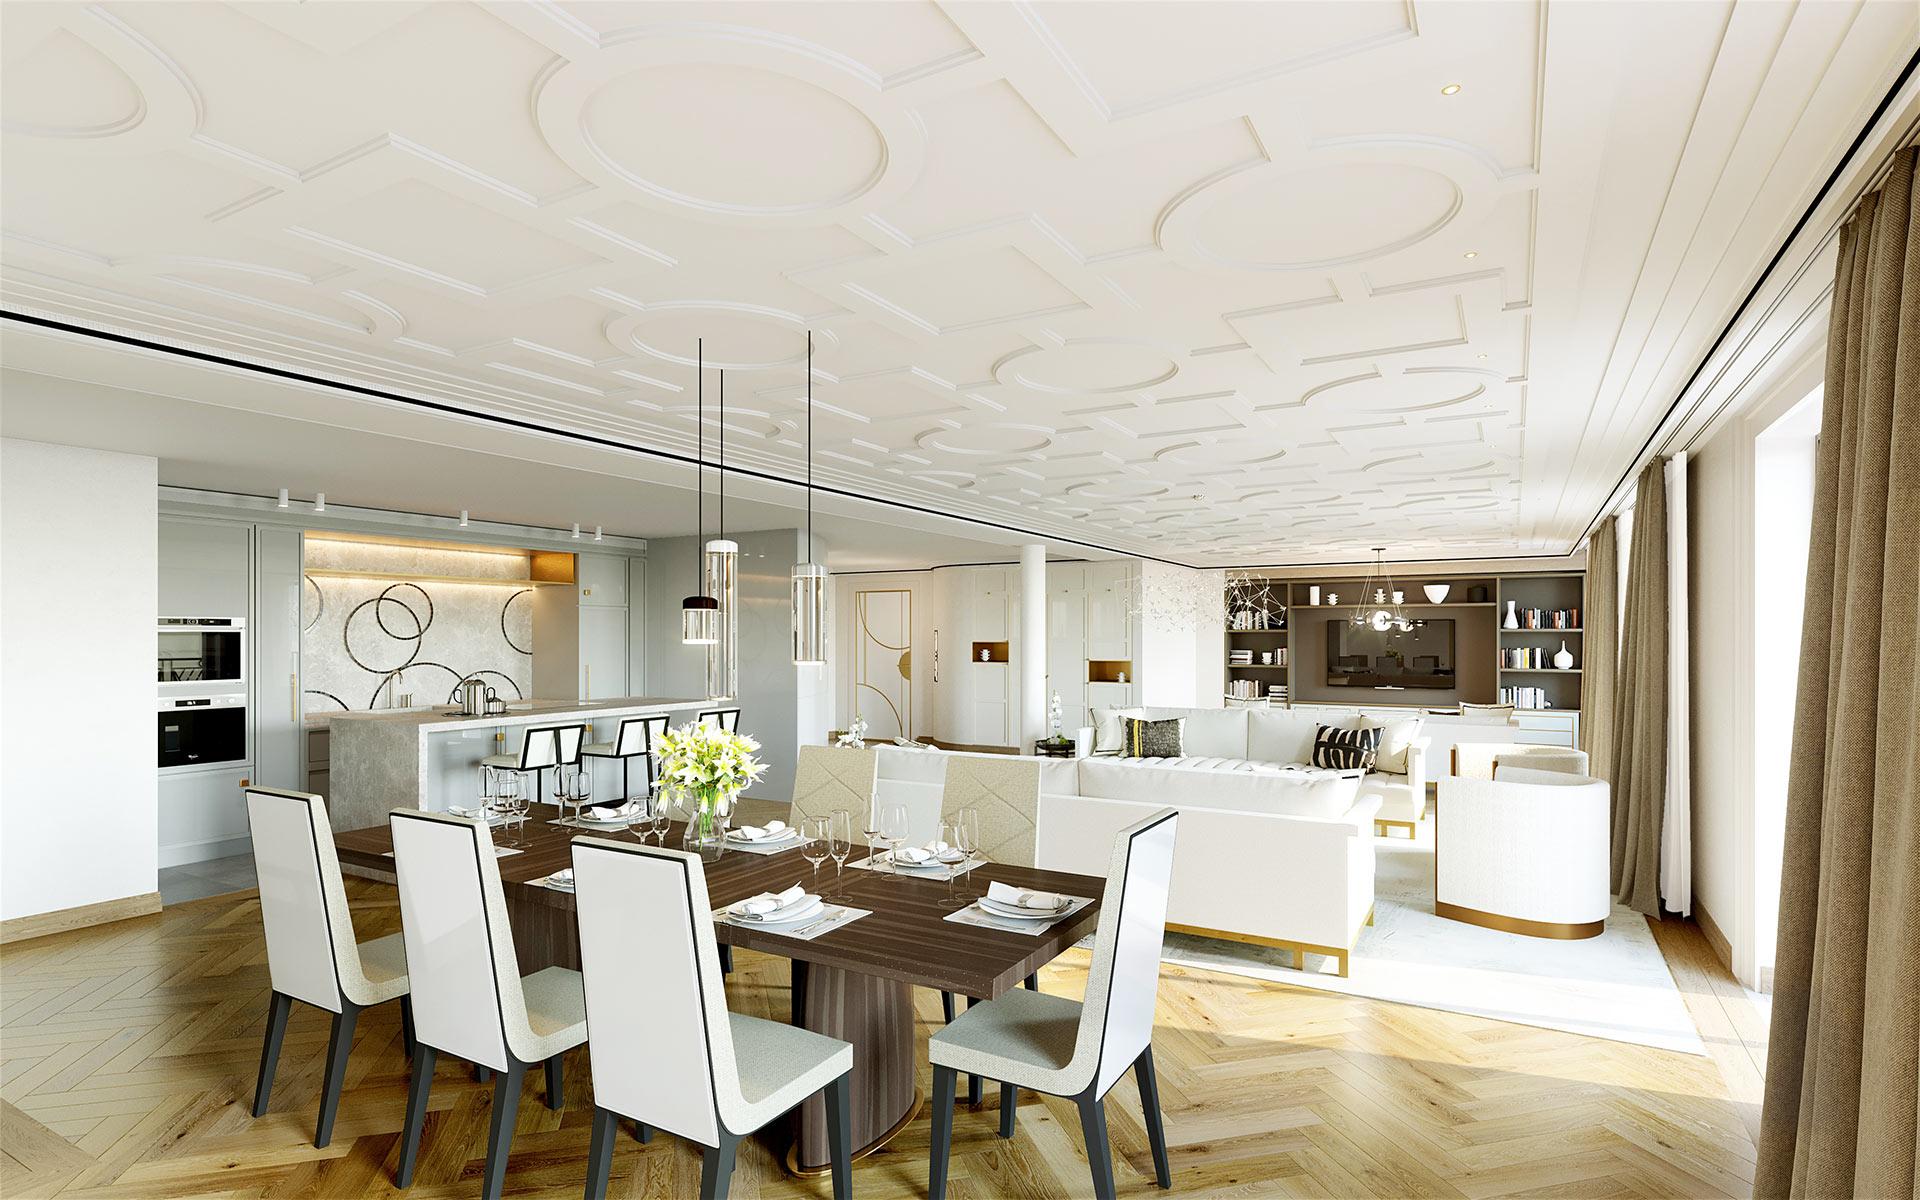 Lunchroom perspective in a luxury villa